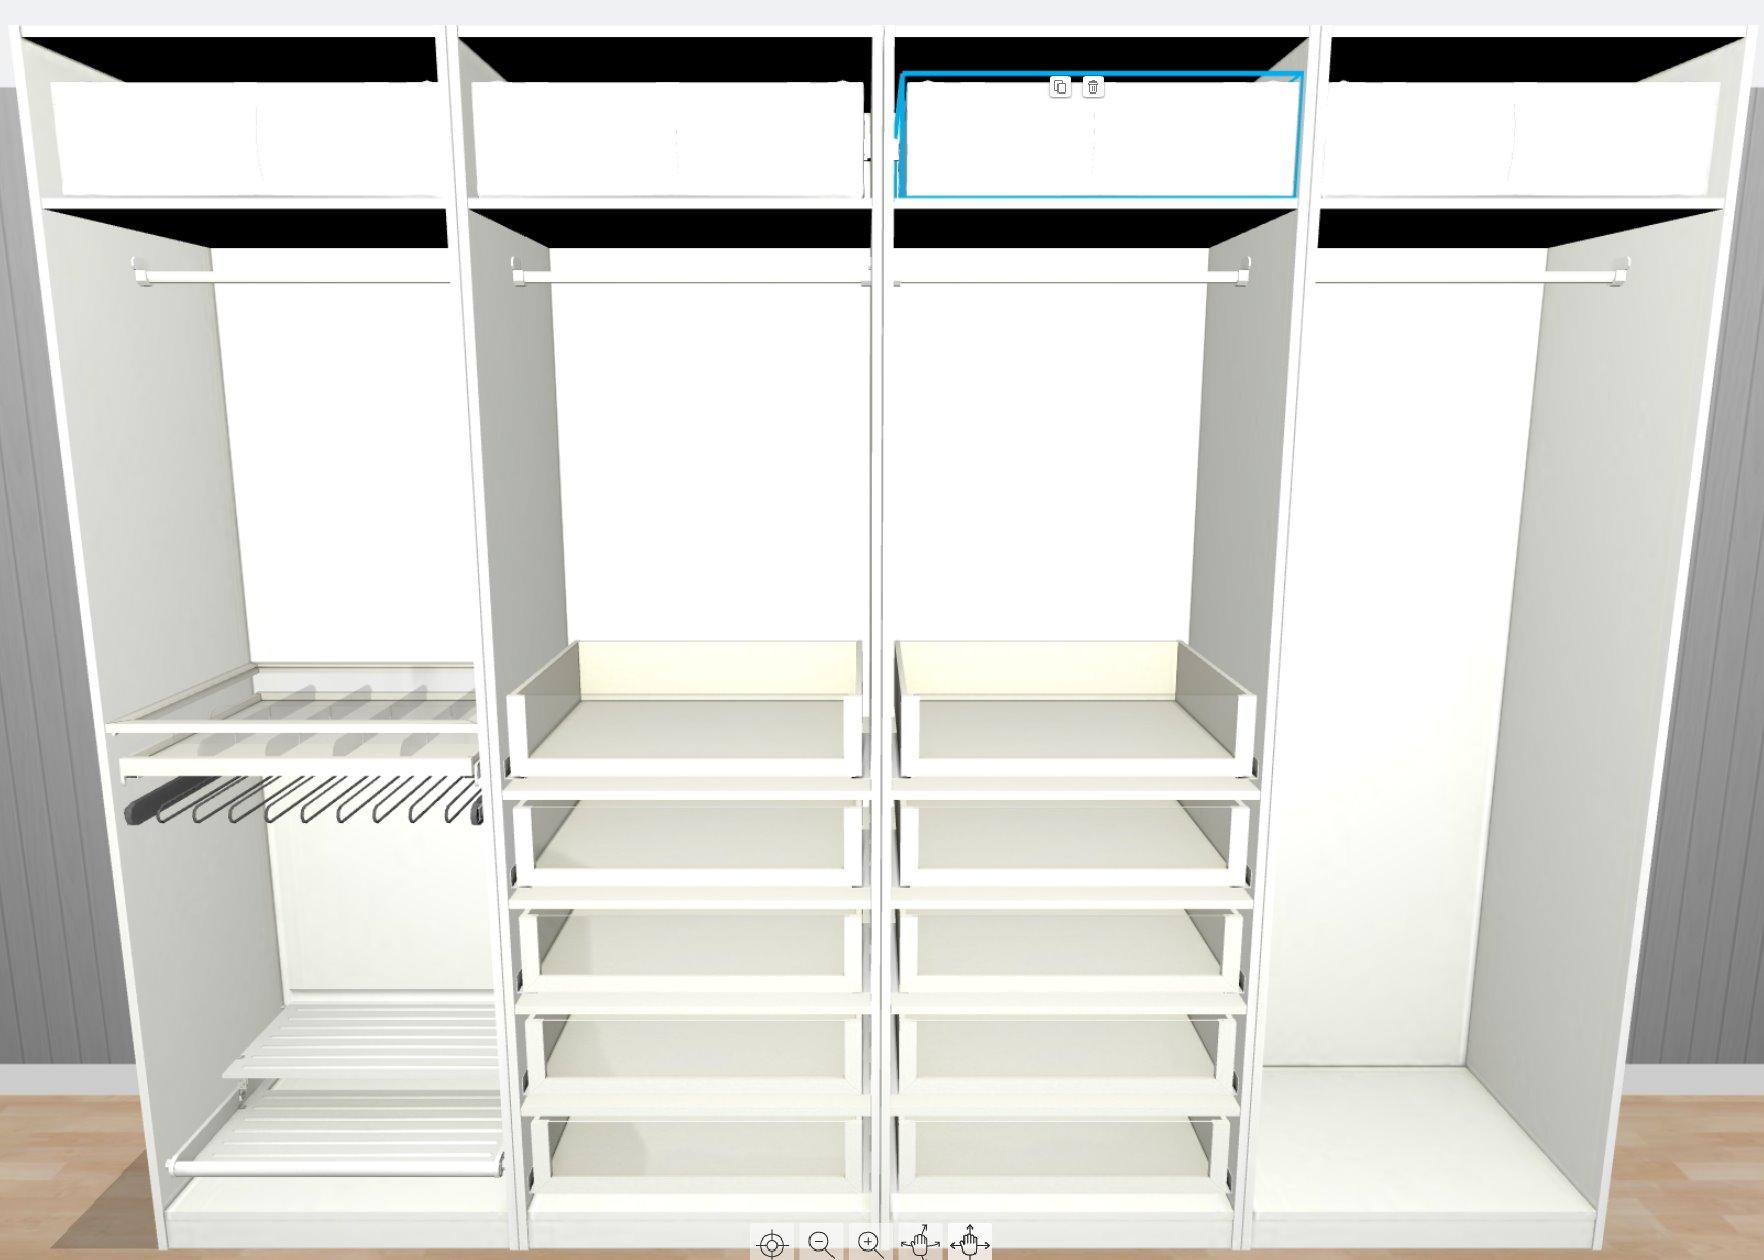 Ikea Pax Kast Monteren Werkspot